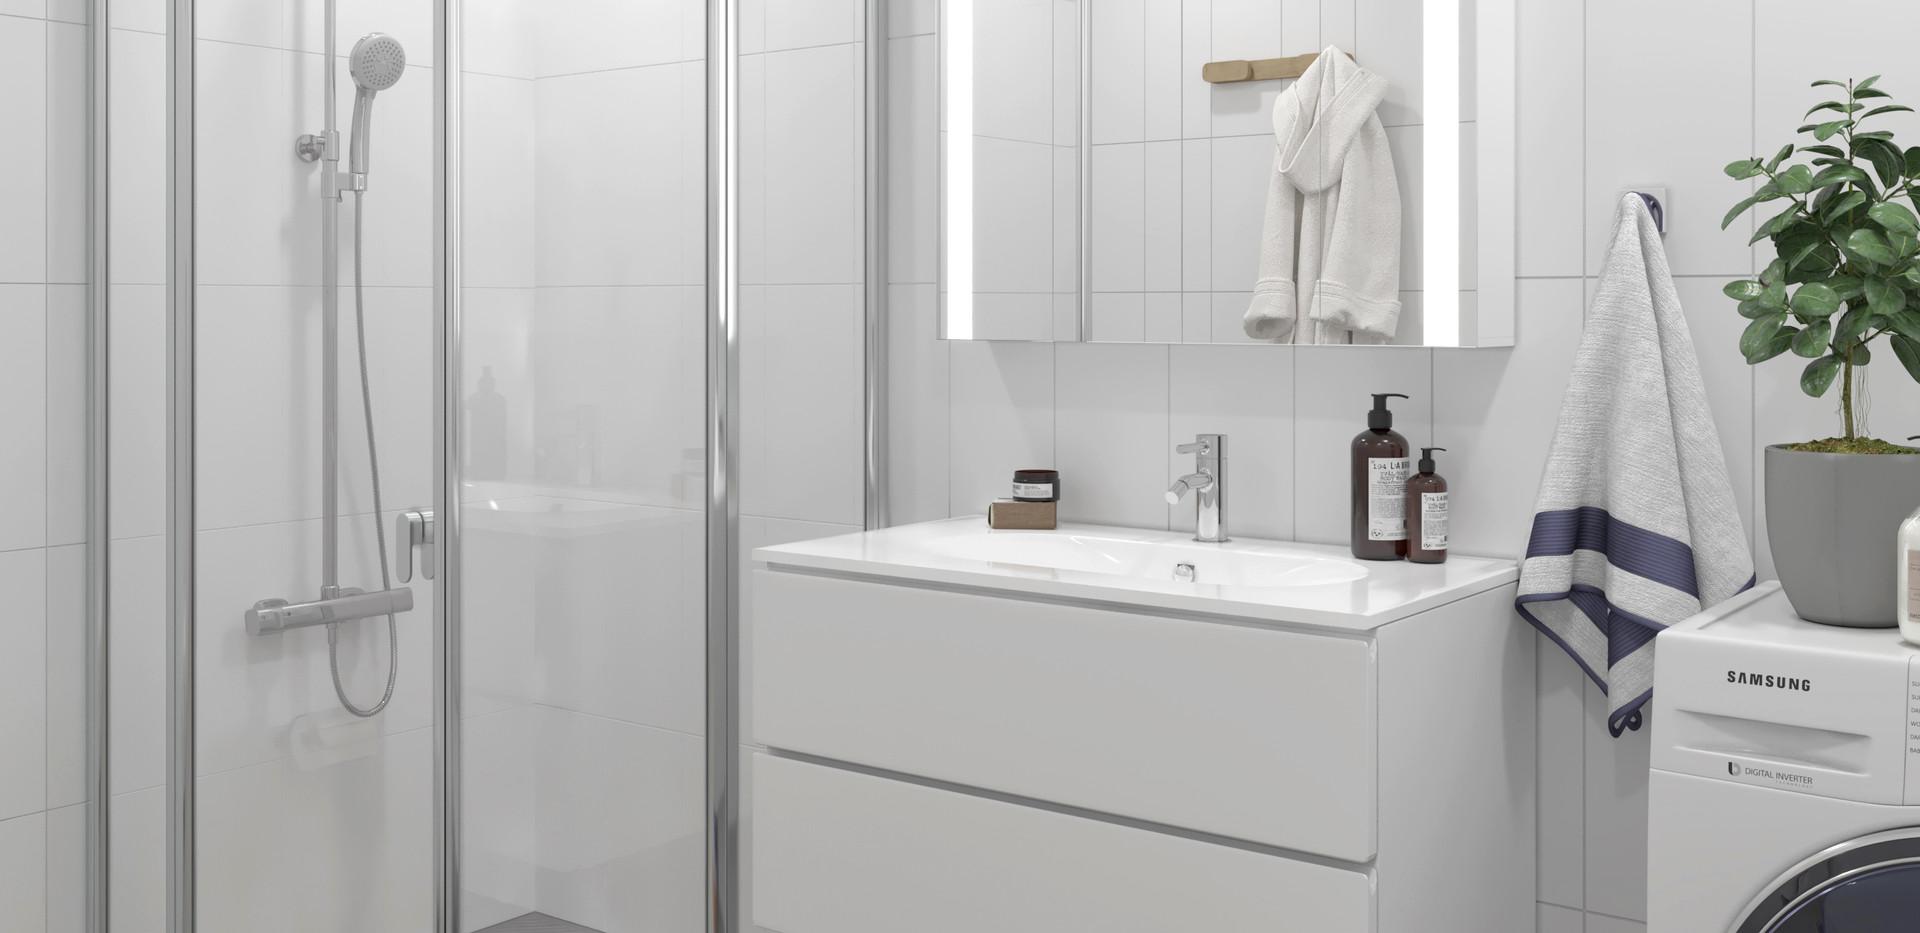 Mosveien_Interior_A4105 bathroom_tz5.jus